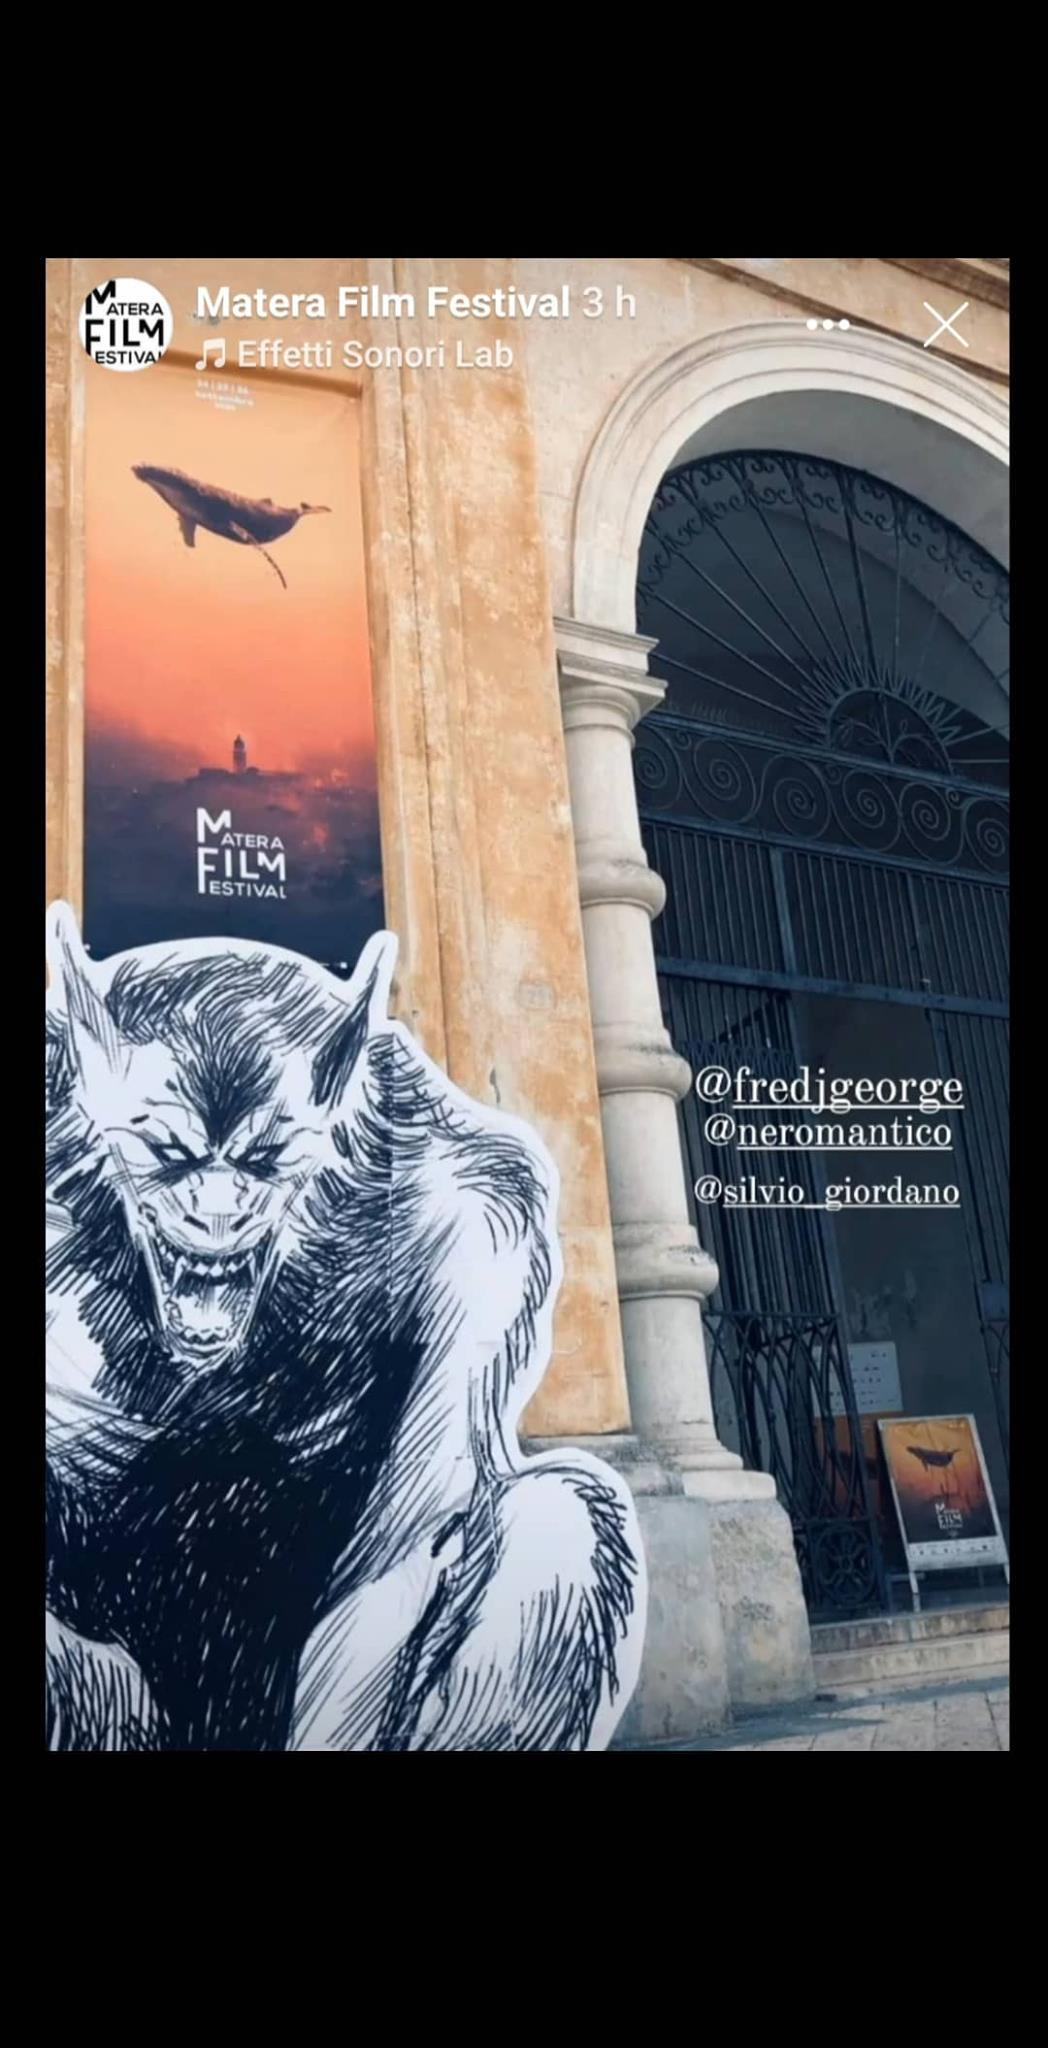 Matera Film Festival 2020